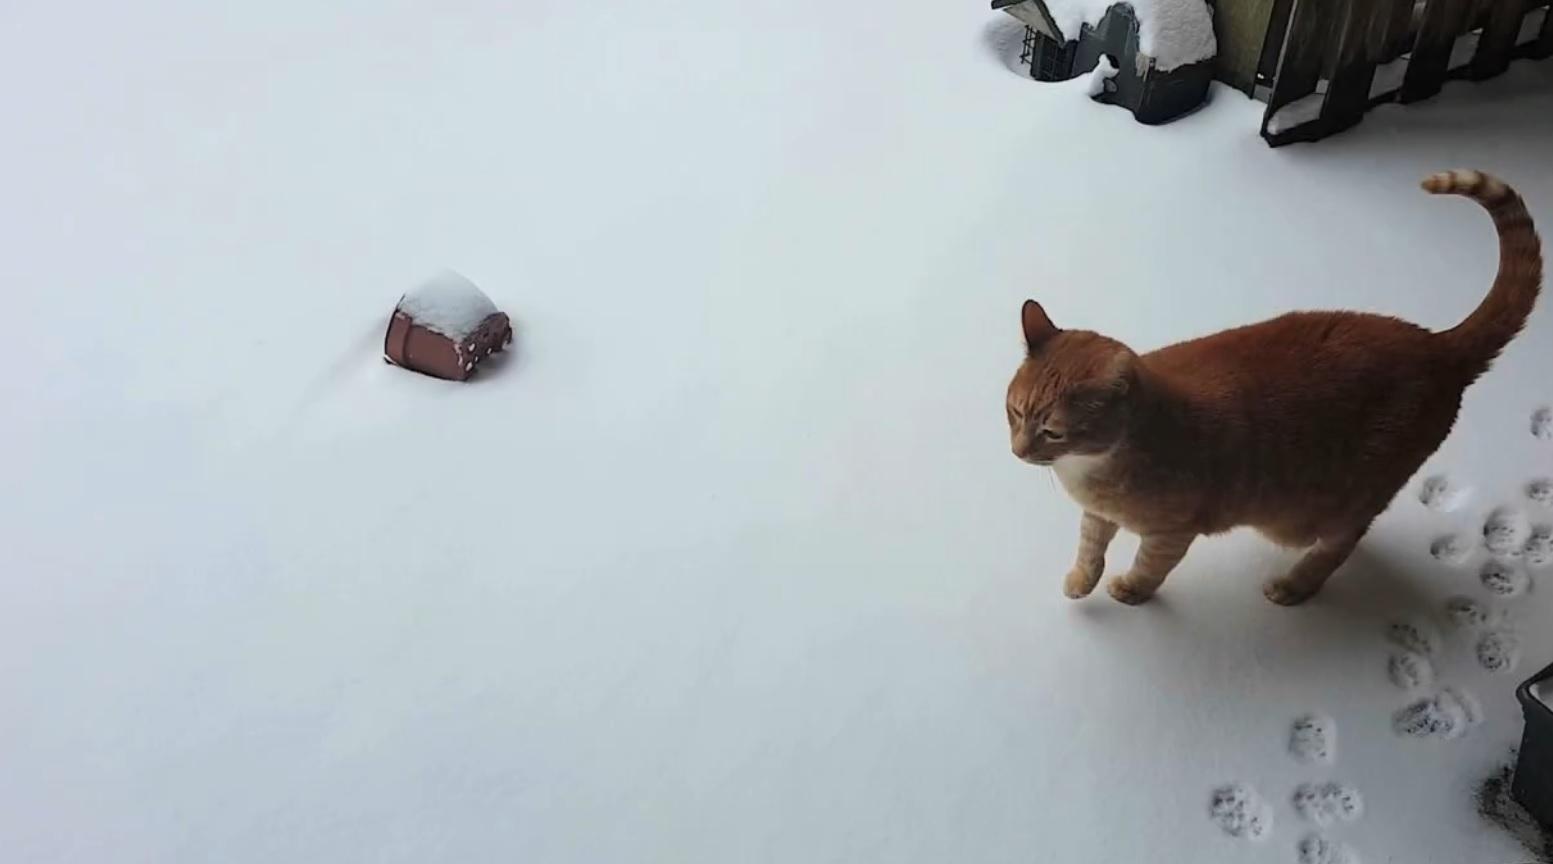 Alvi Checking Out The Snow